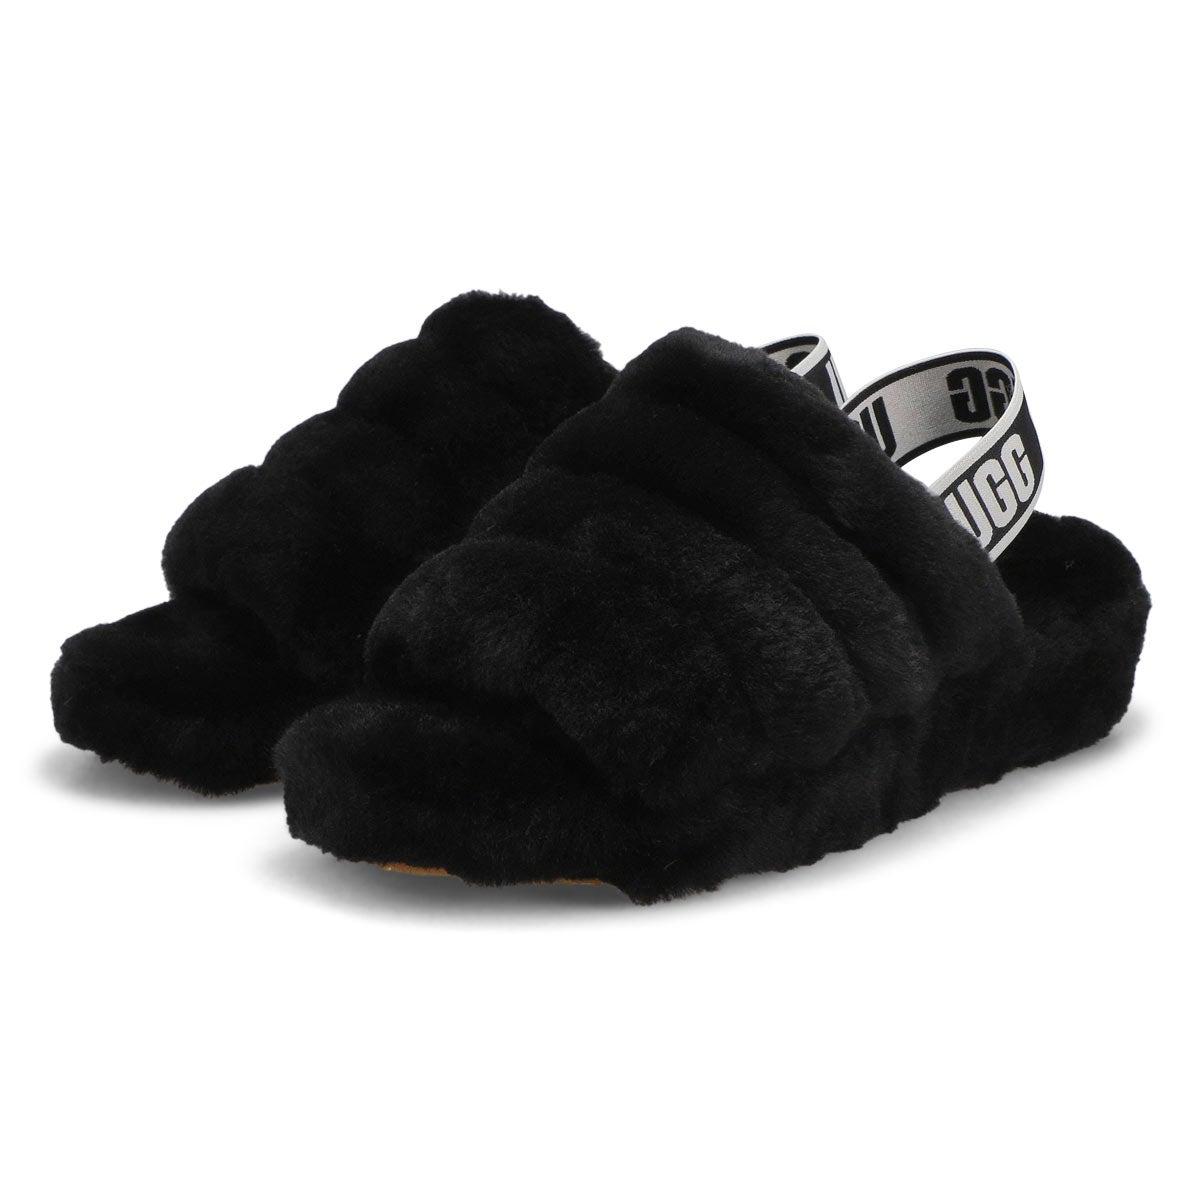 Women's Fluff Yeah Sheepskin Slipper - Black